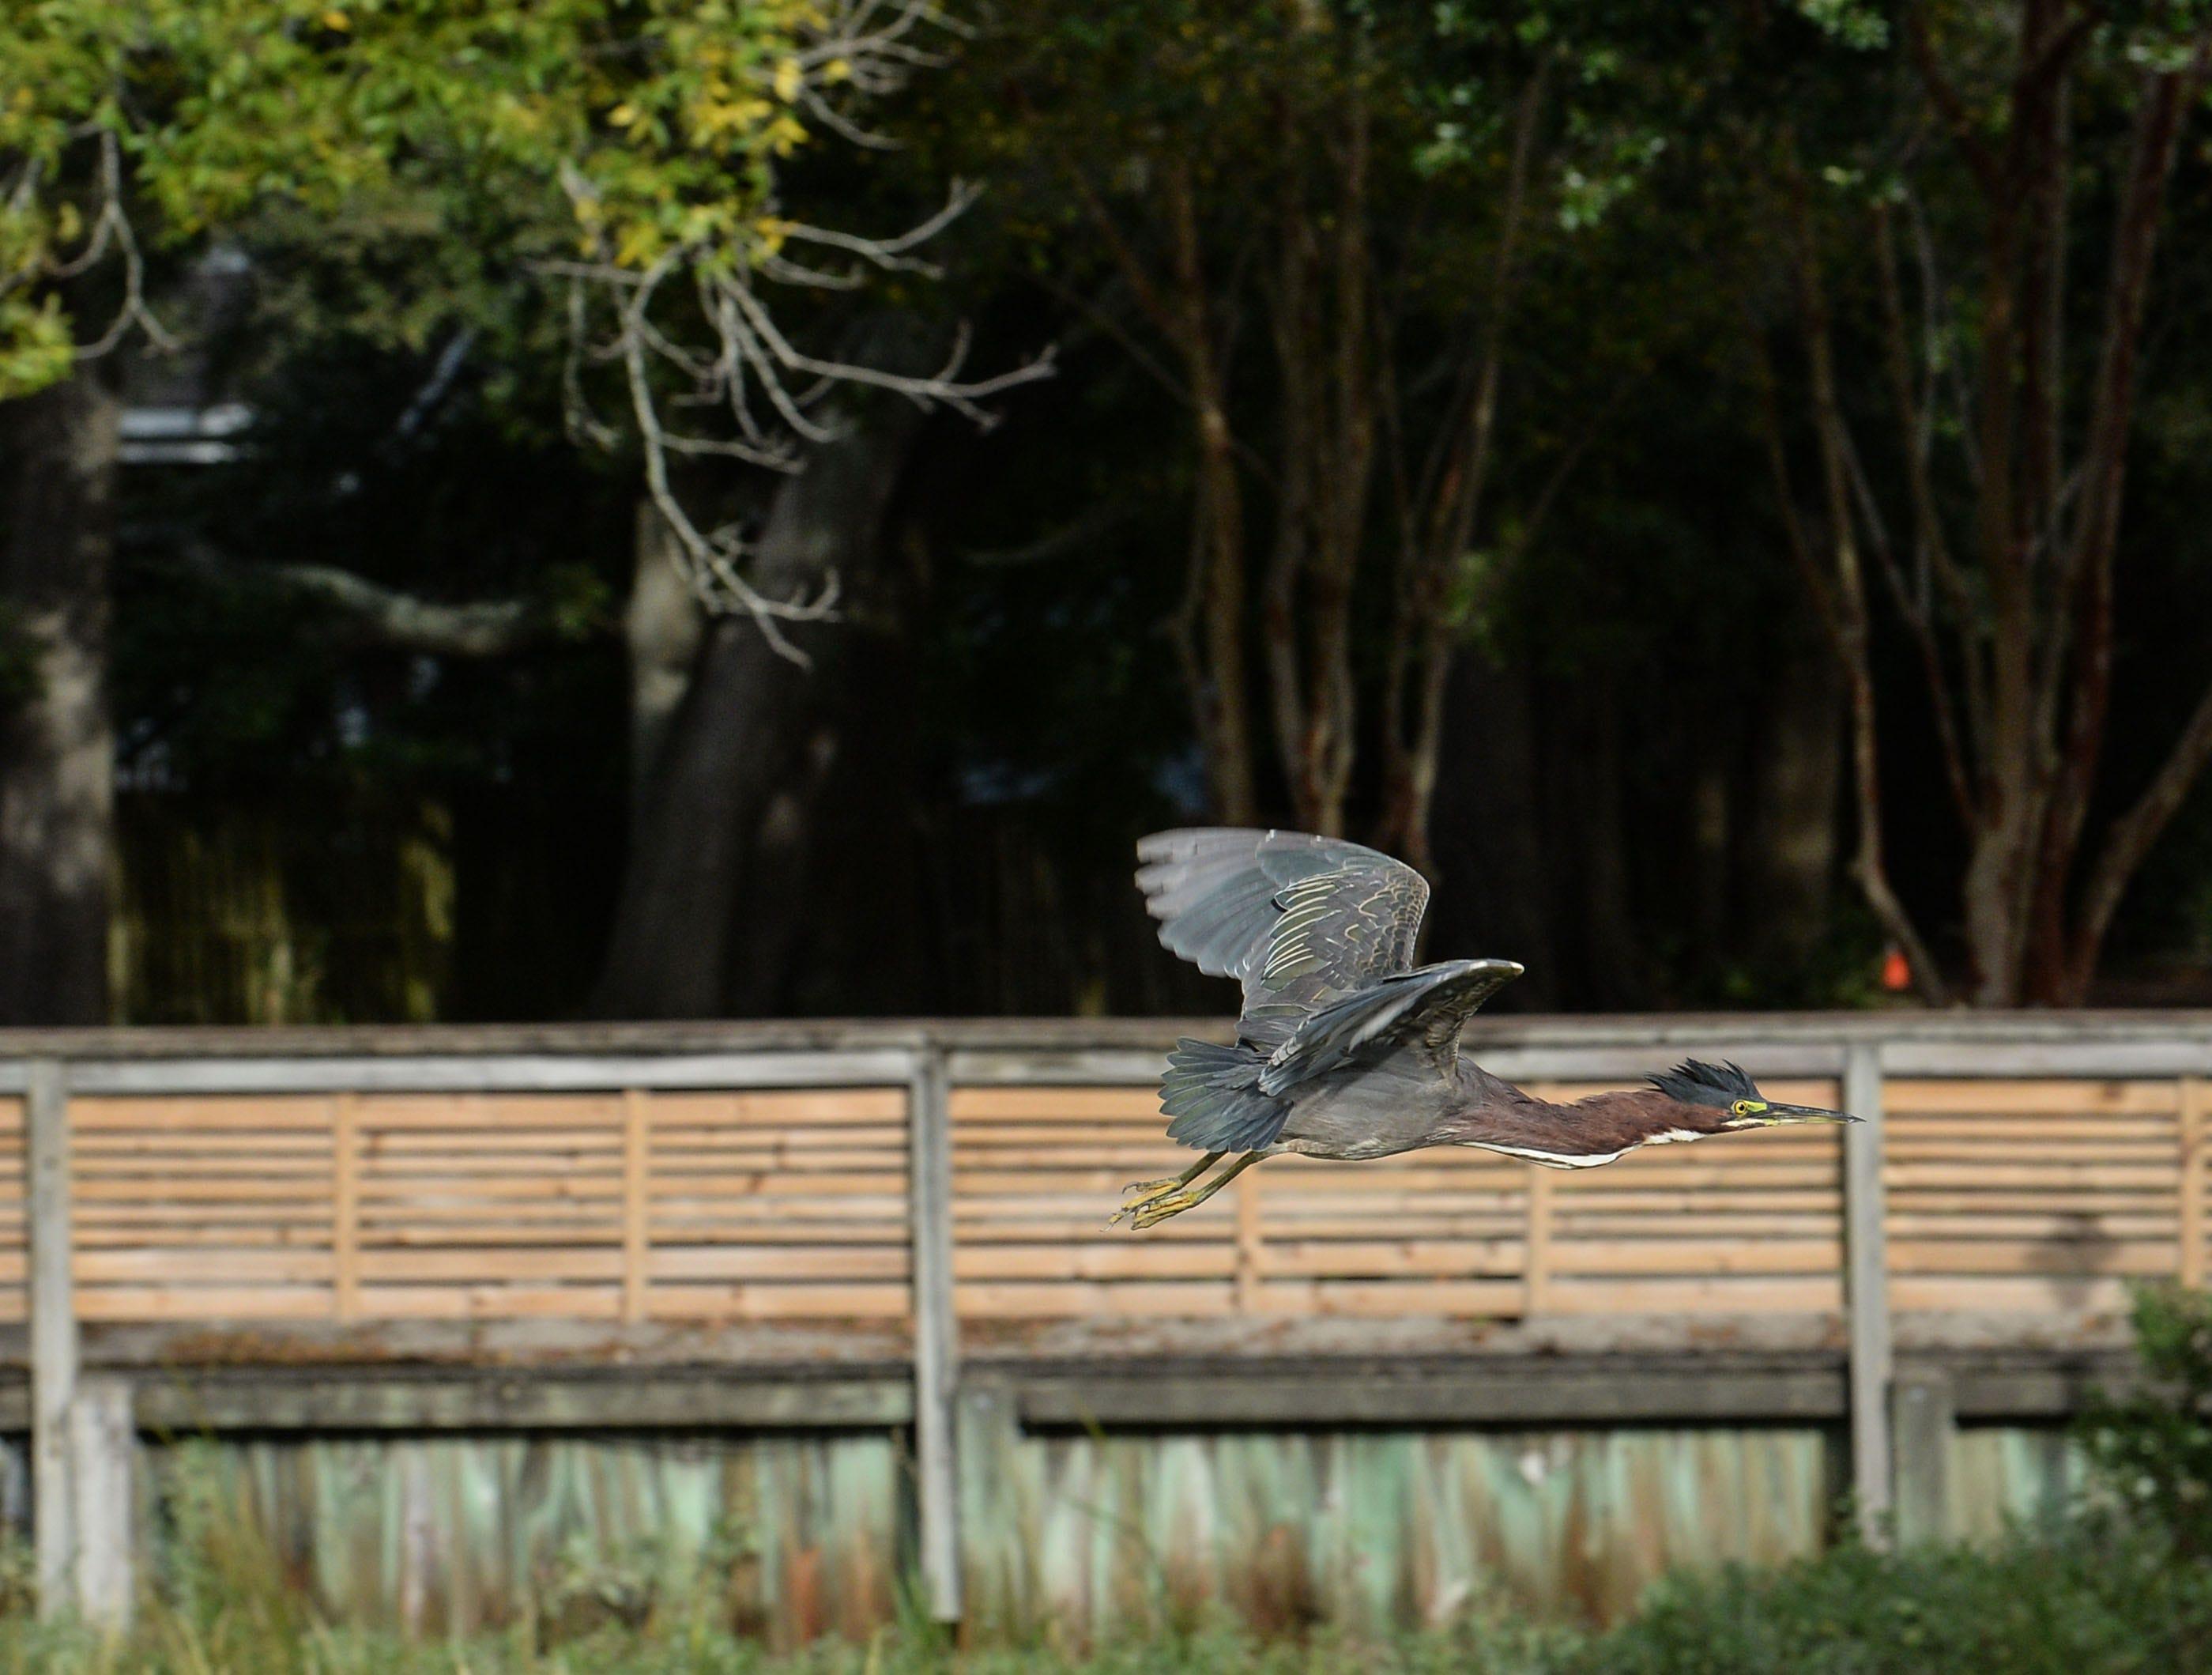 A bird flies away from Crocker's Landing harbor in Wilmington, N.C., before Hurricane Florence hits Wilmington, North Carolina on Thursday, September 13, 2018. (Ken Ruinard / Greenville News / Gannett USA Today Network / 2018 )